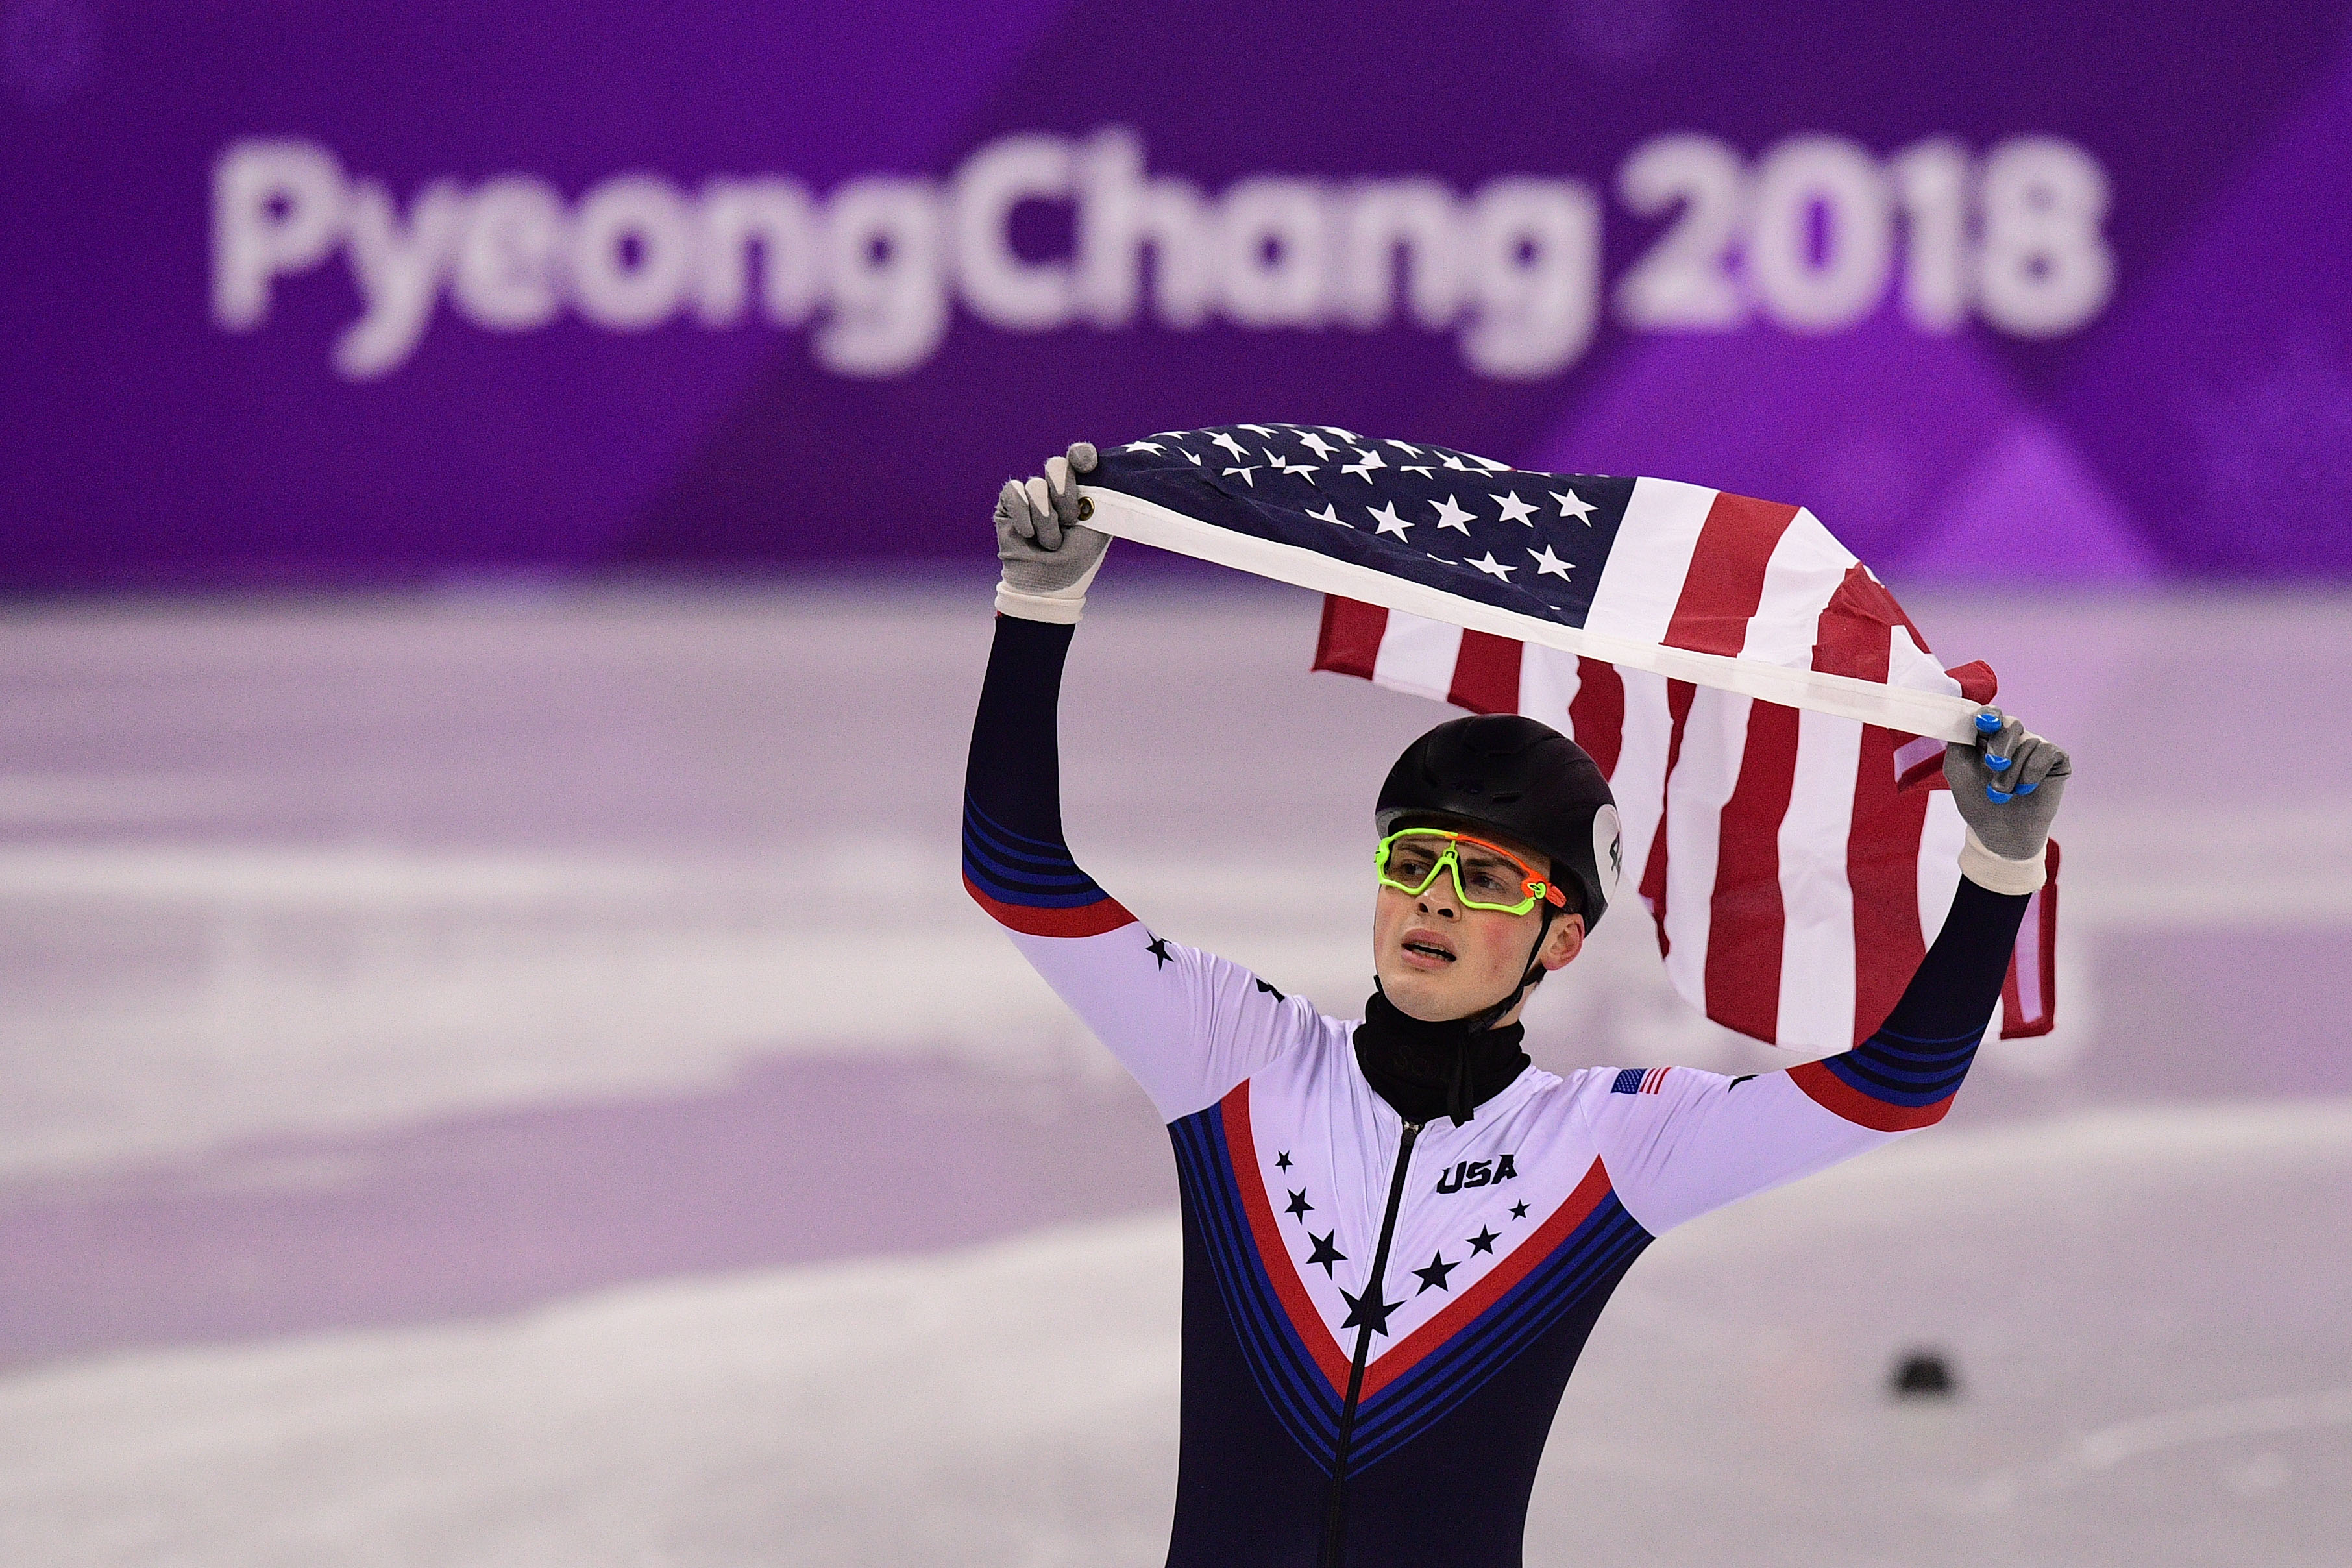 USA medalist John-Henry Krueger's big night through his parents' eyes at the 2018 Winter Olympics